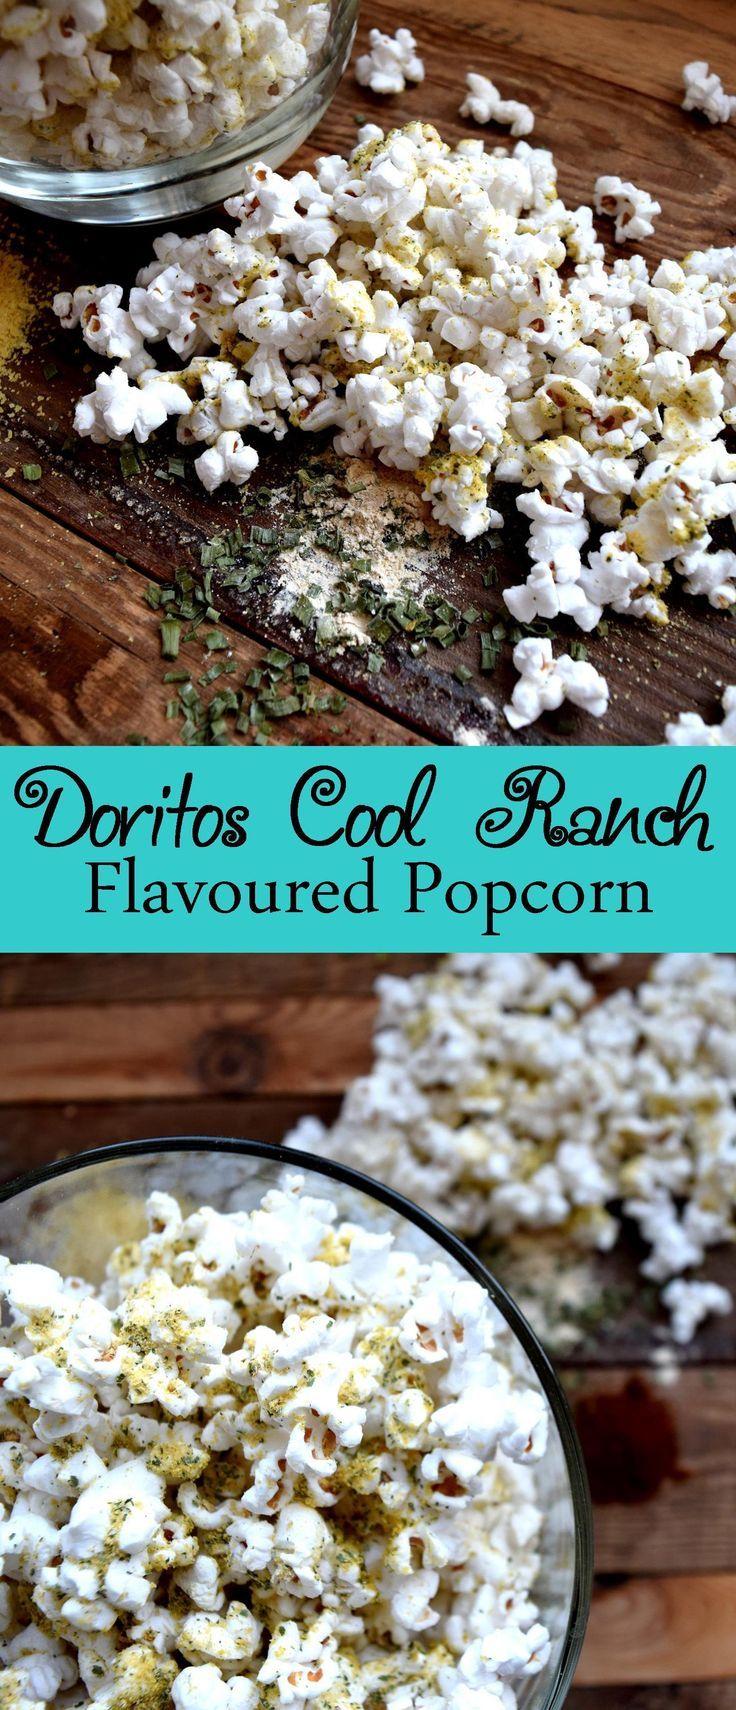 Doritos cool ranch flavoured popcorn popcorn seasoning